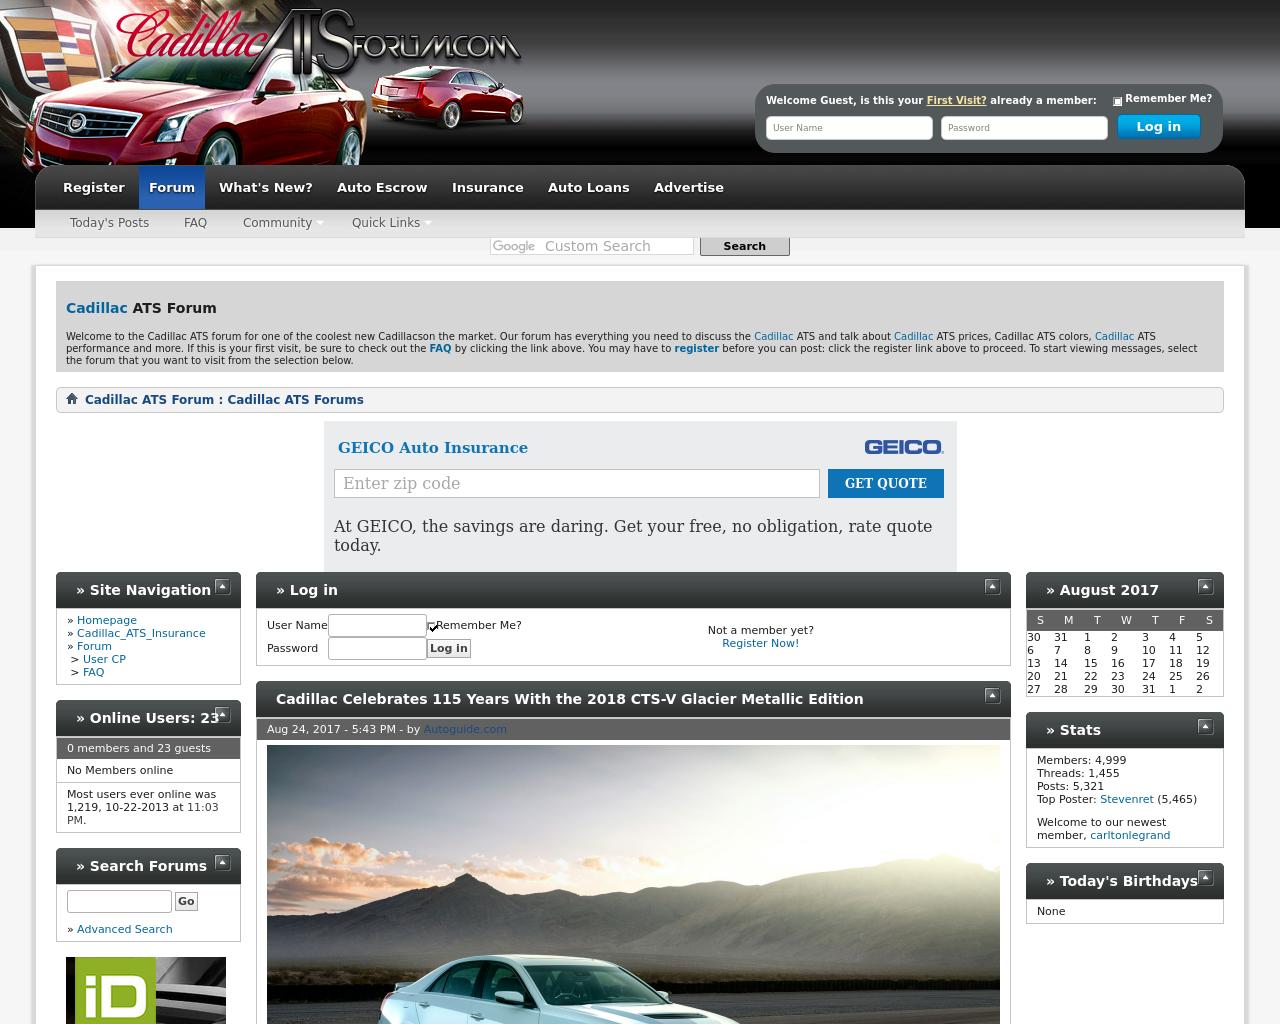 Cadillac-ATS-Forum-Advertising-Reviews-Pricing